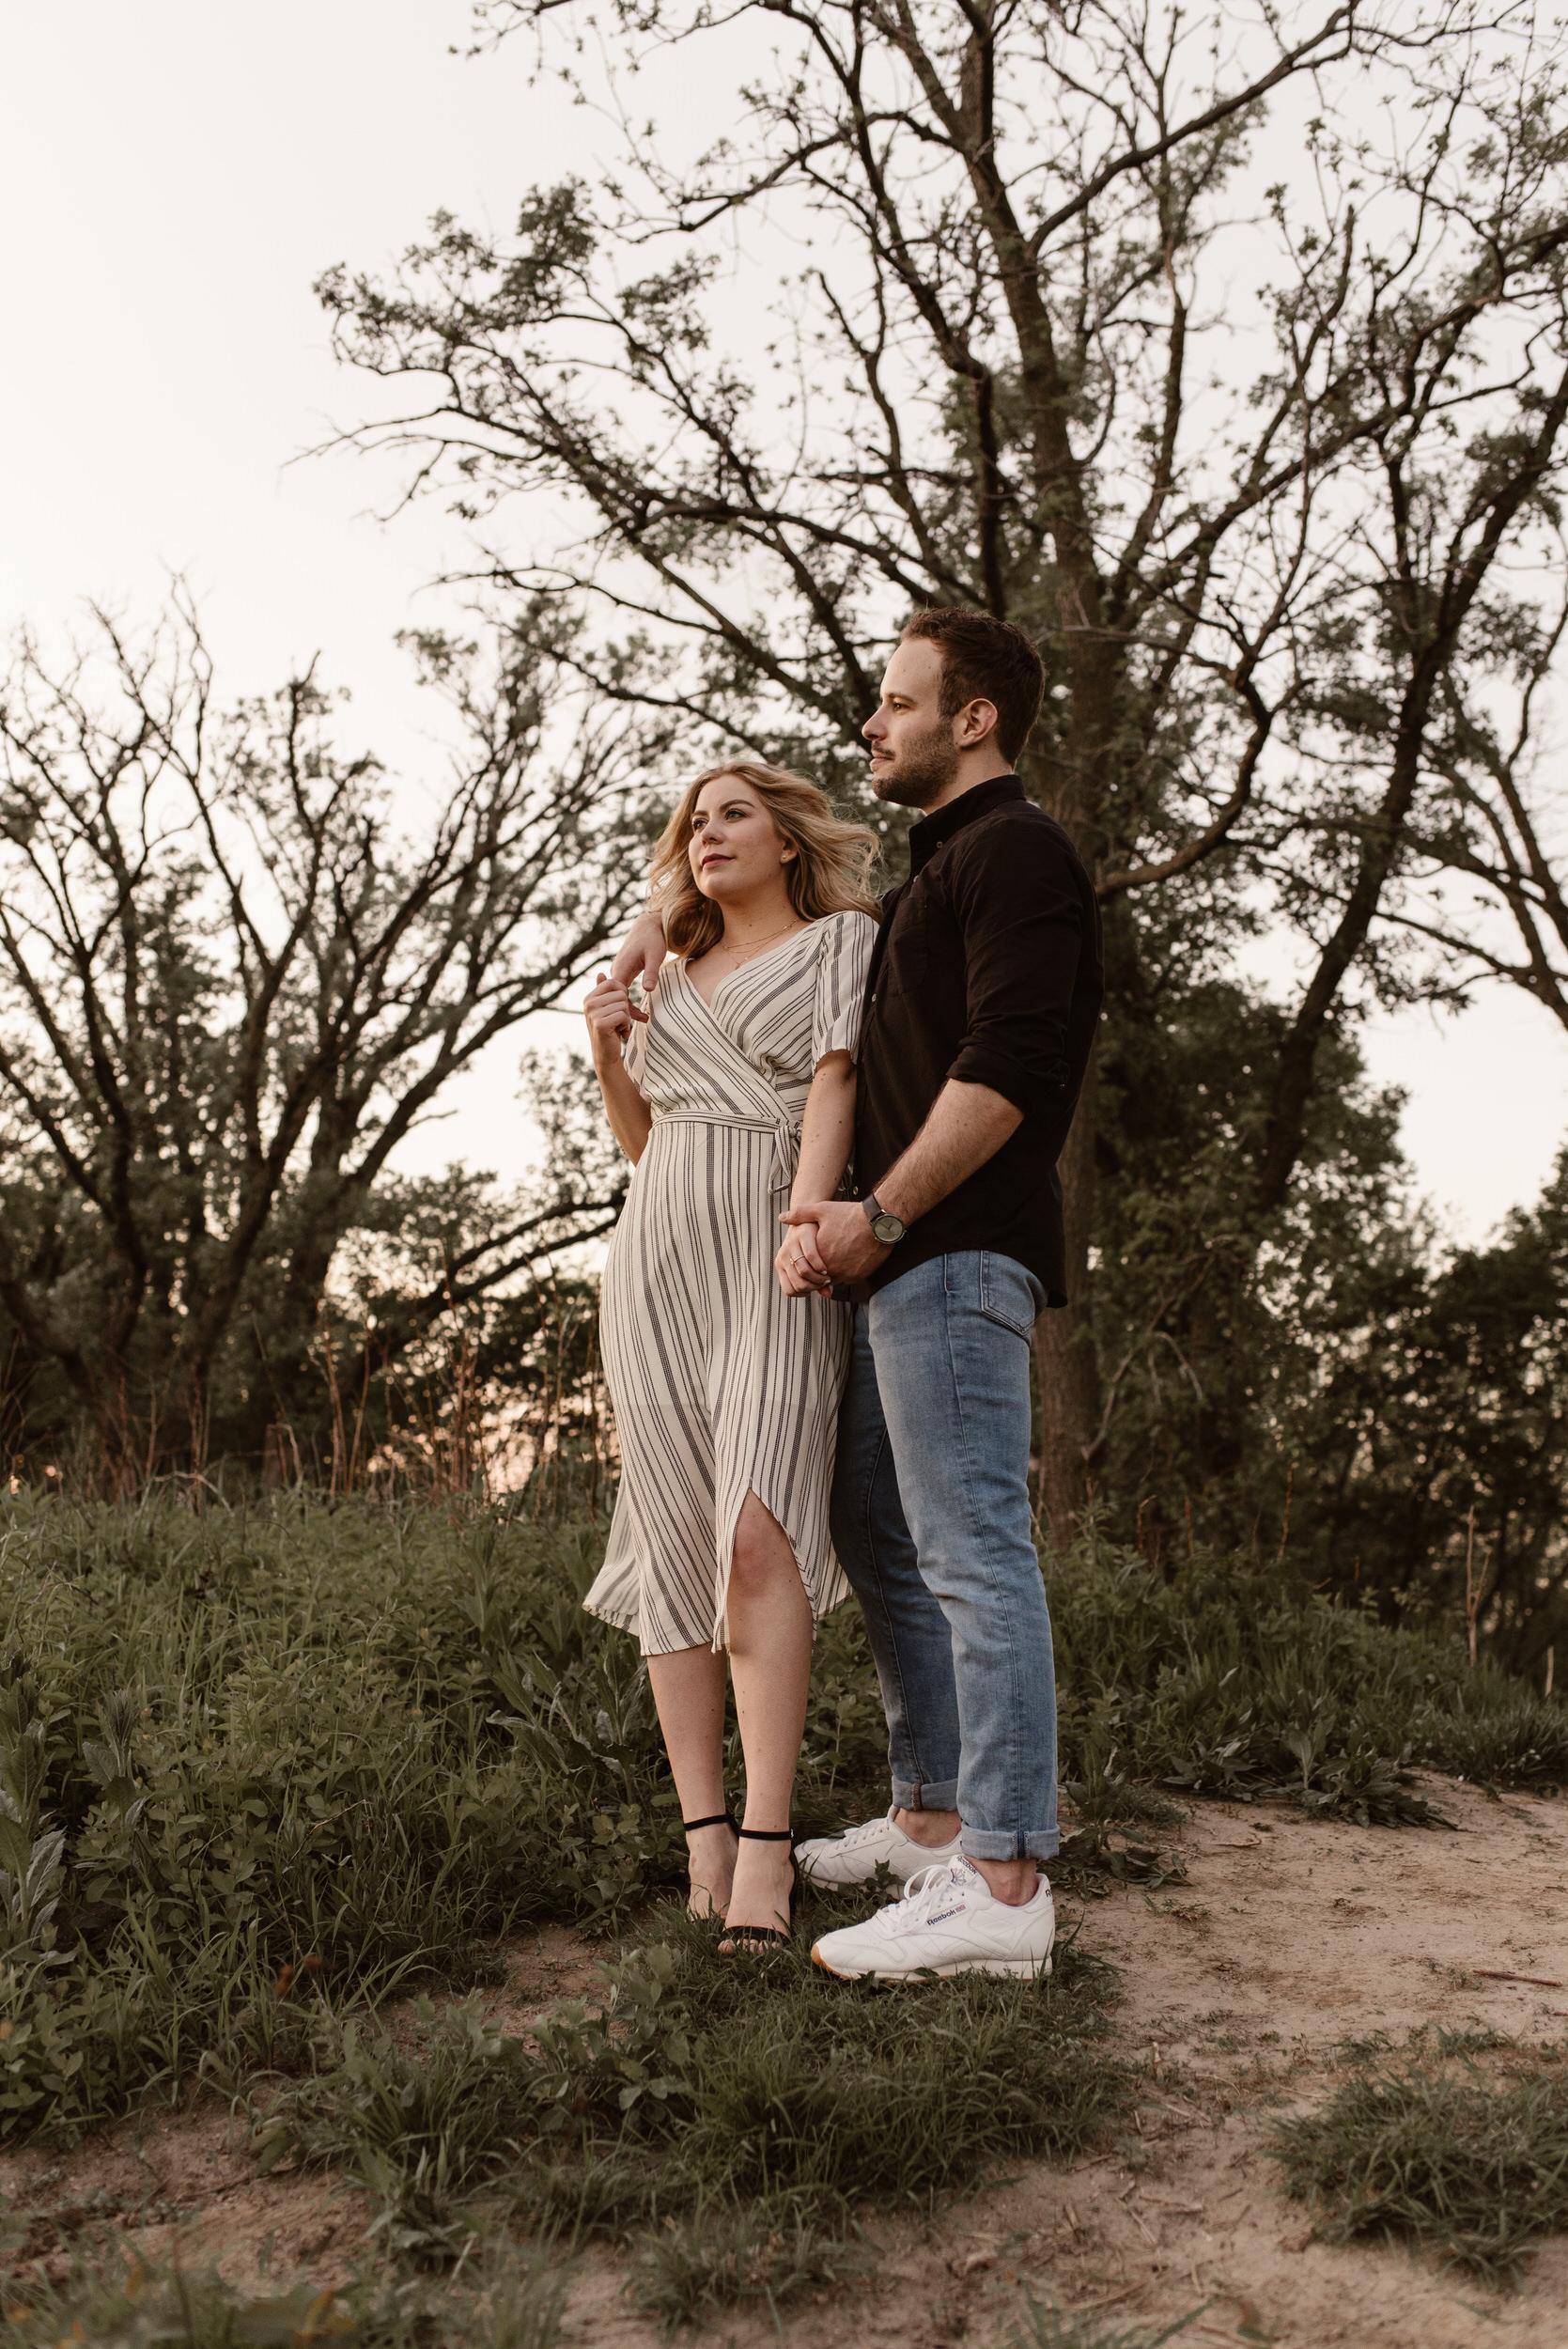 Omaha-Nebraska-Engagement-Session-Kaylie-Sirek-Photography-174.jpg